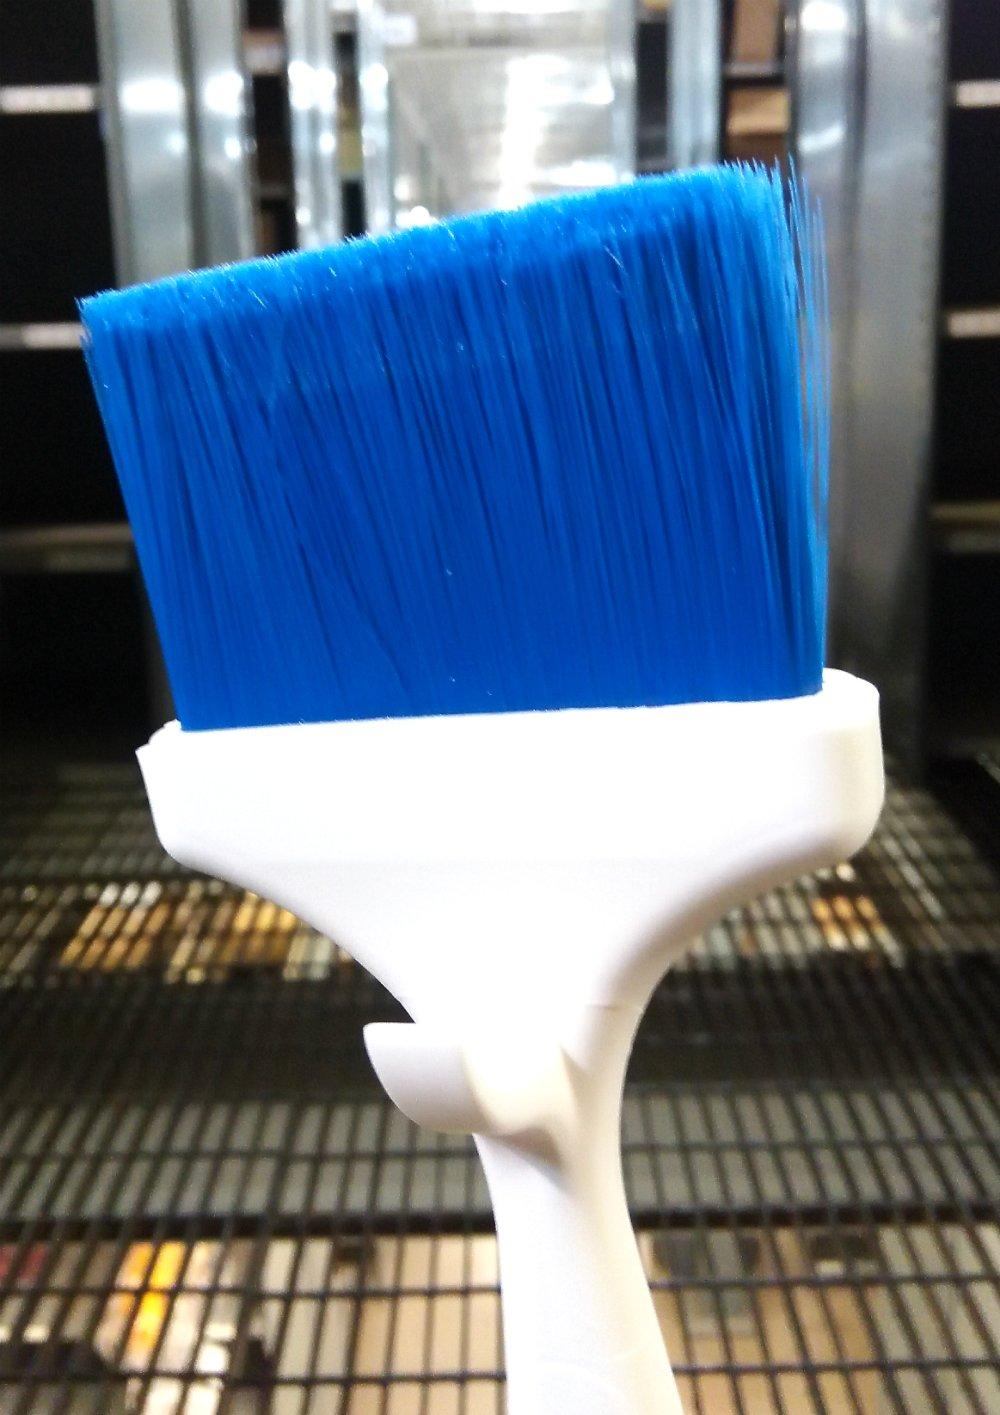 Carlisle 4040214 Sparta Meteor Pastry/Basting Brush, 3'', Blue